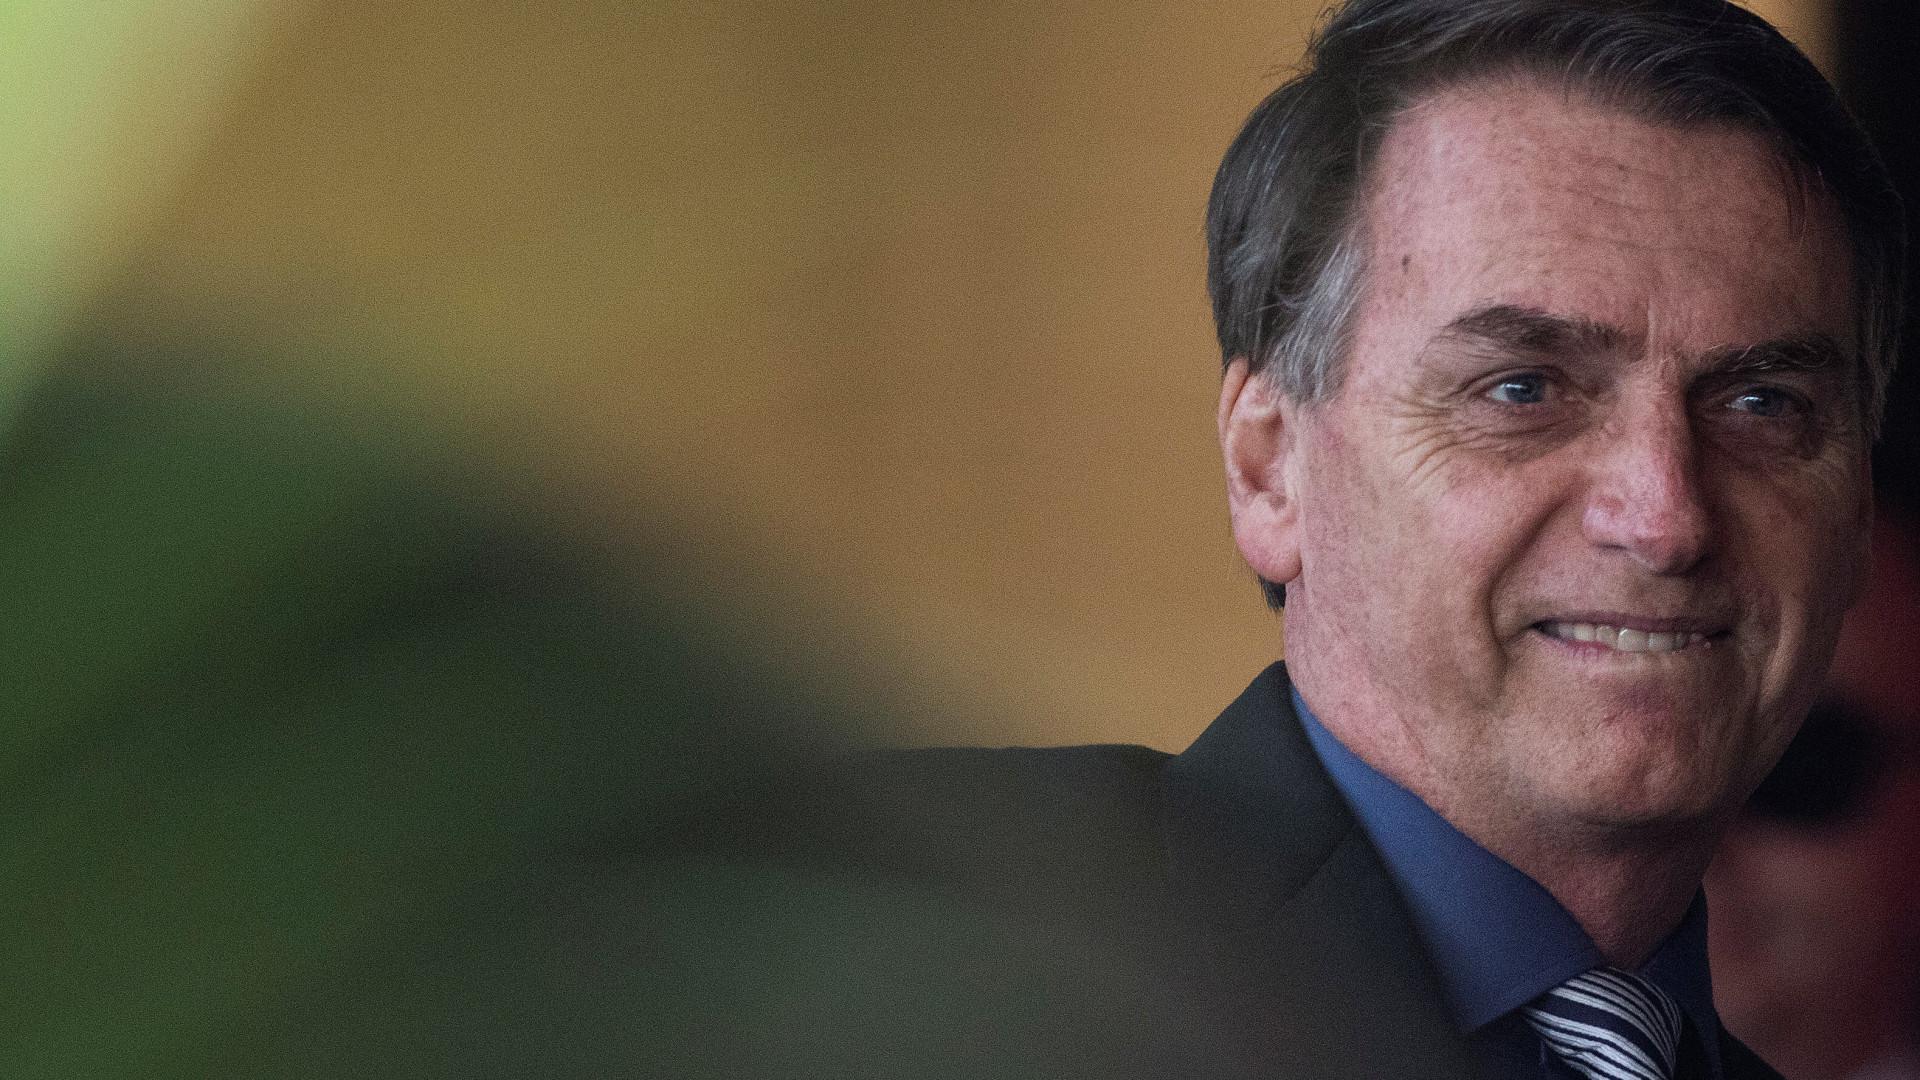 Twitter e Facebook negam que Bolsonaro tenha contratado conteúdos